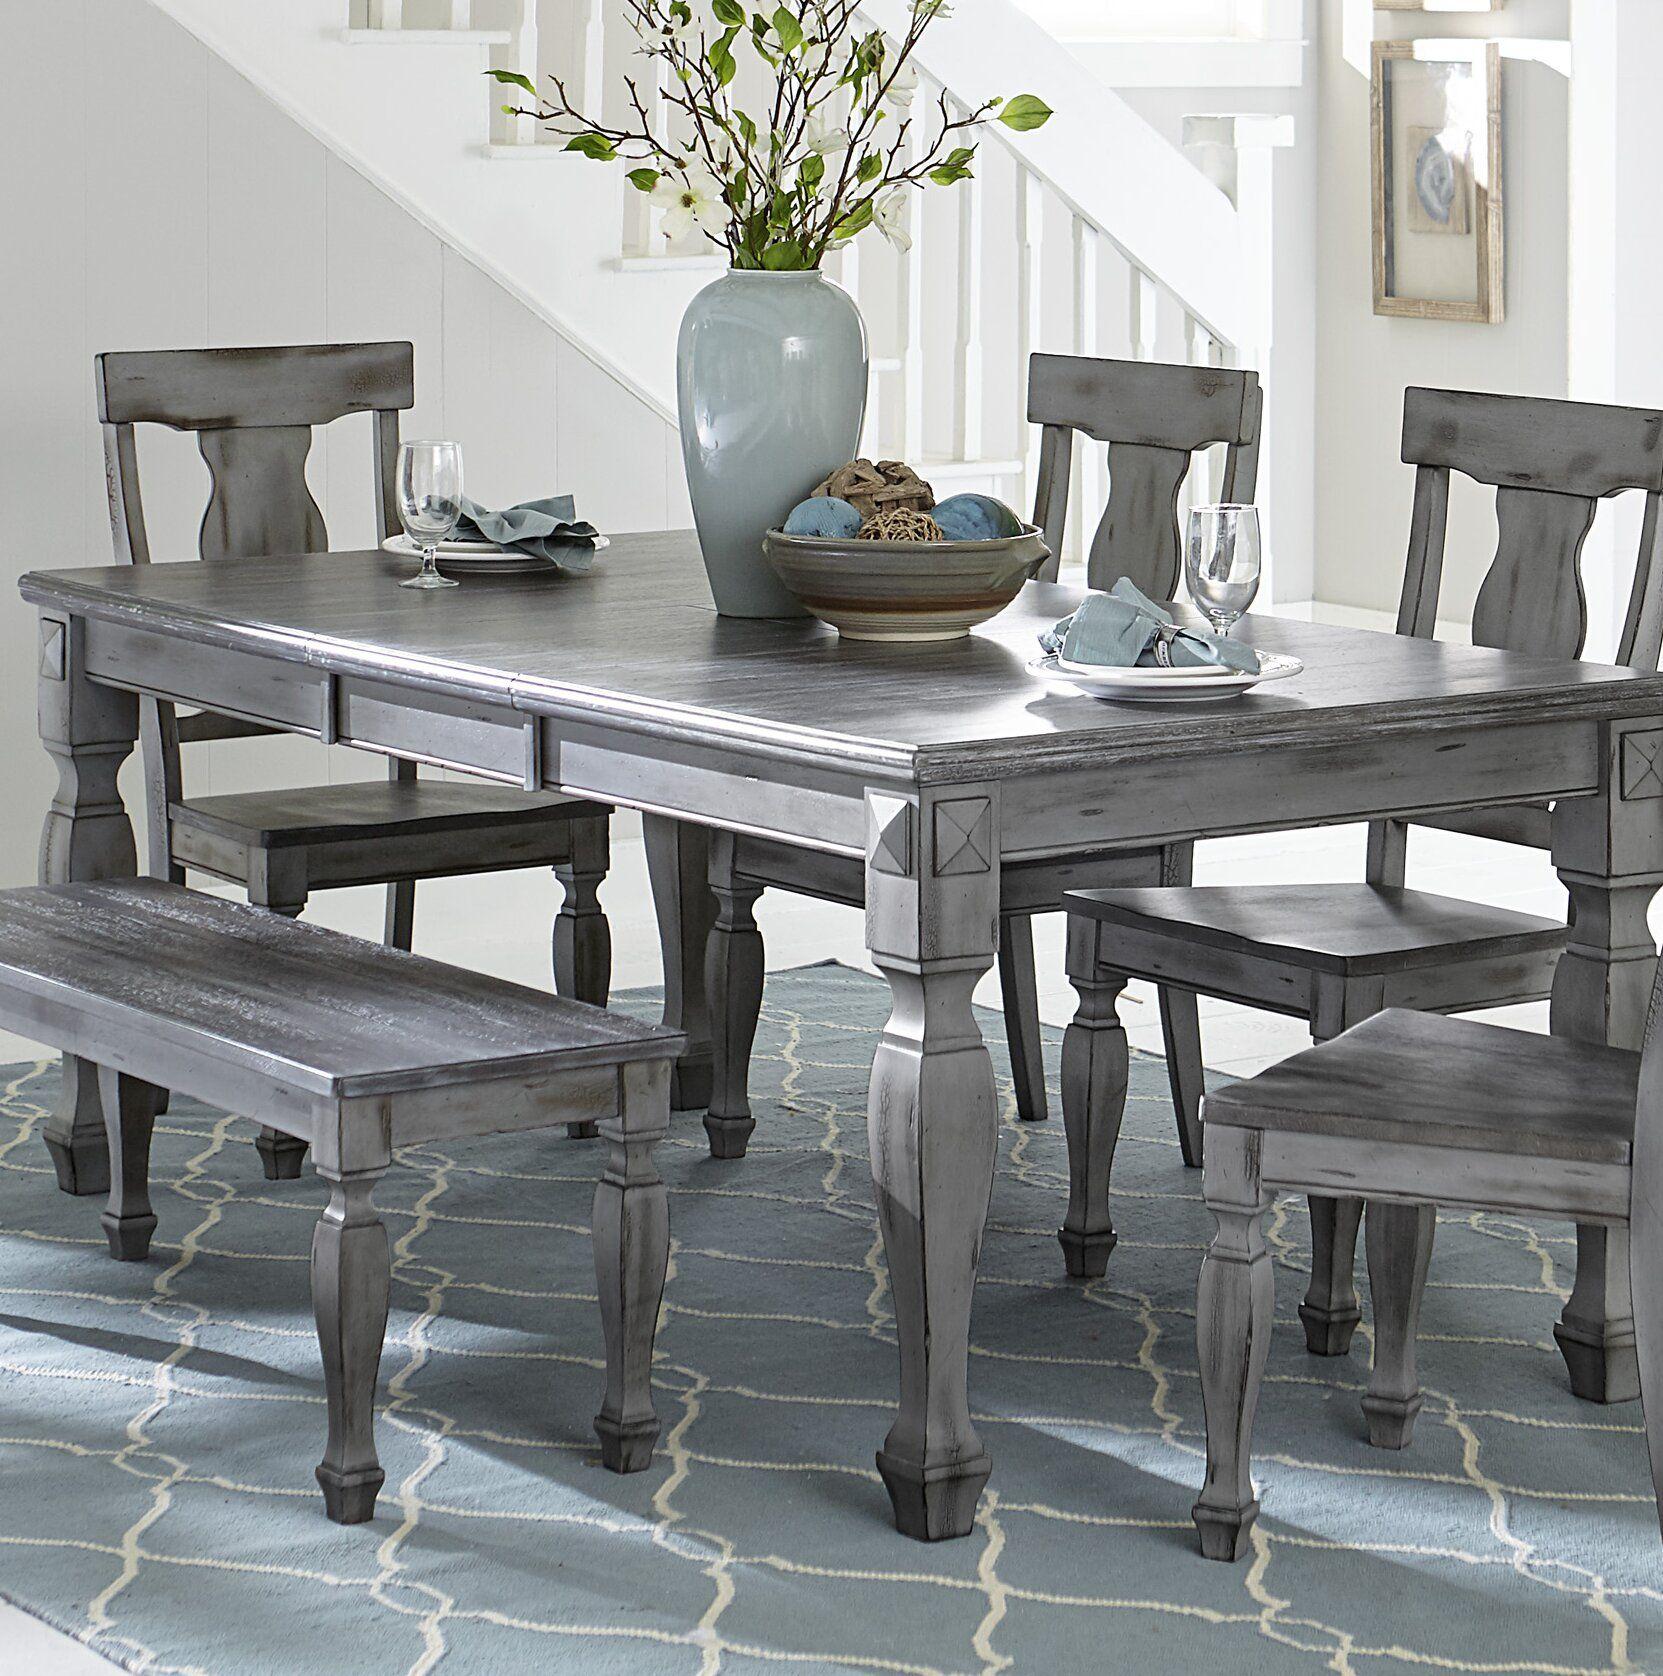 Kara Butterfly Leaf Rubberwood Solid Wood Dining Table In 2021 Grey Dining Tables Wood Dining Table Grey Kitchen Table